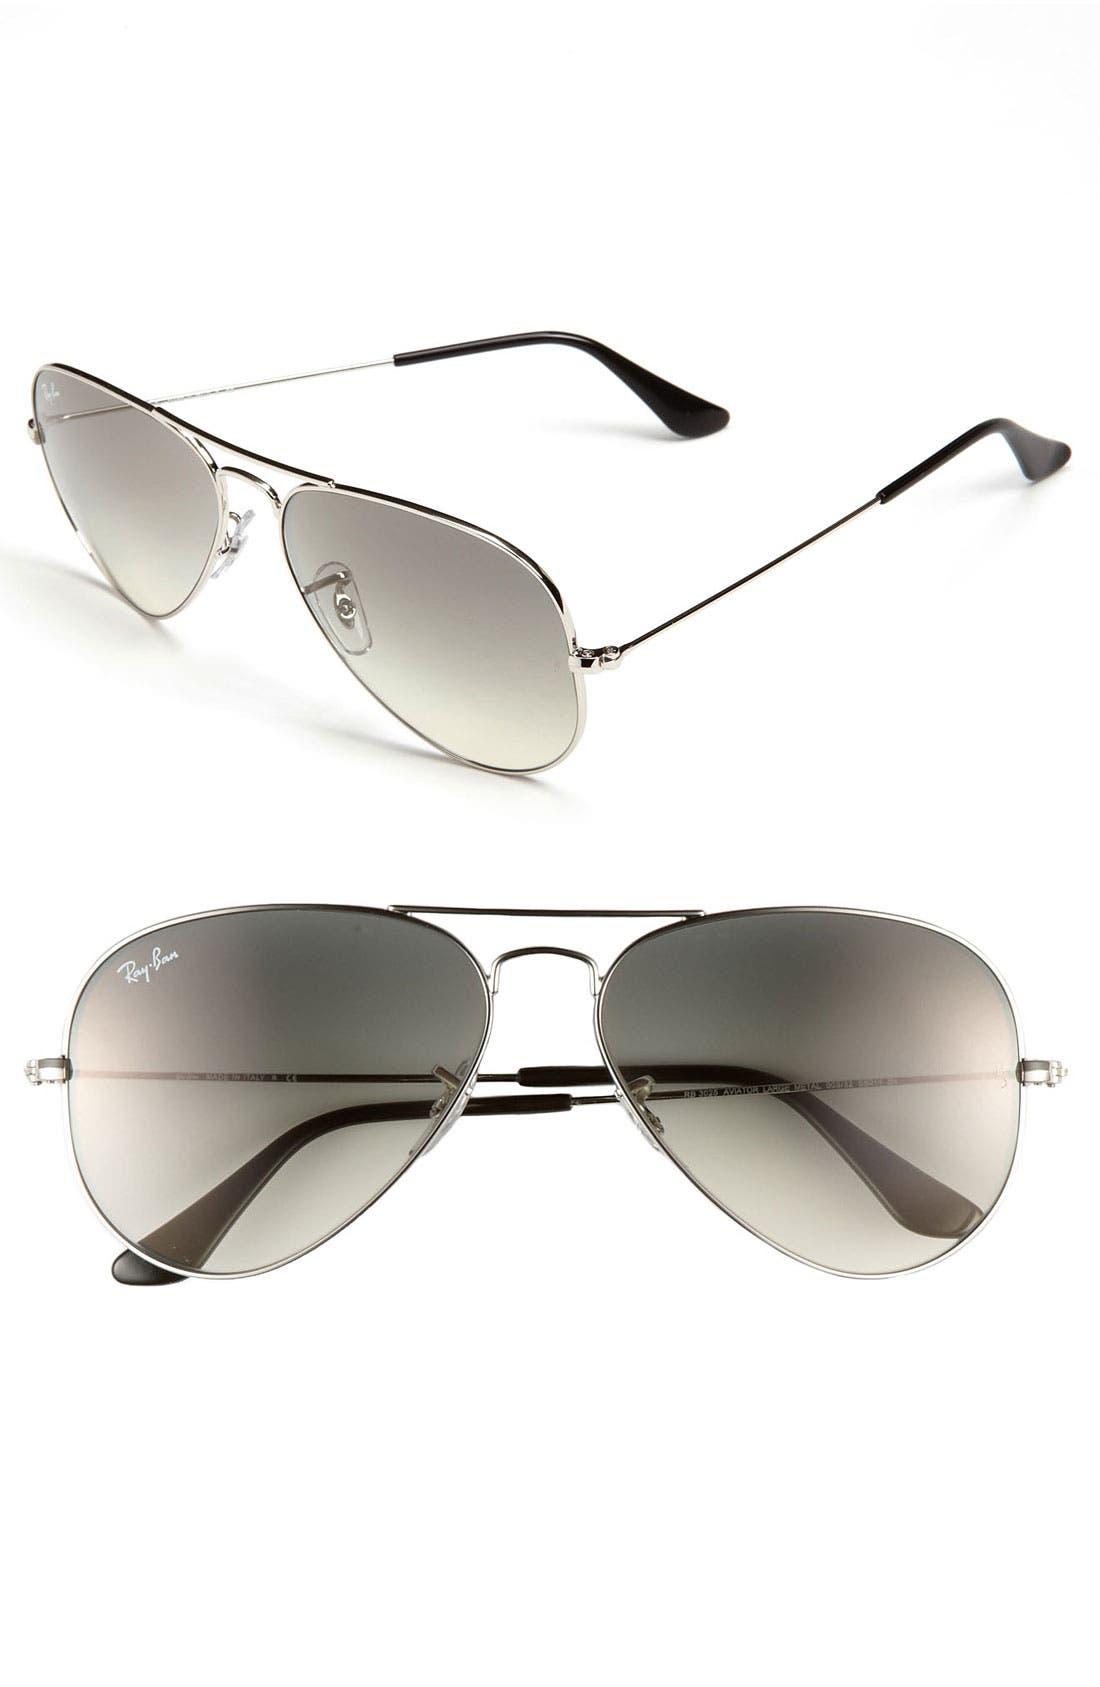 Standard Original 58mm Aviator Sunglasses,                             Main thumbnail 1, color,                             050